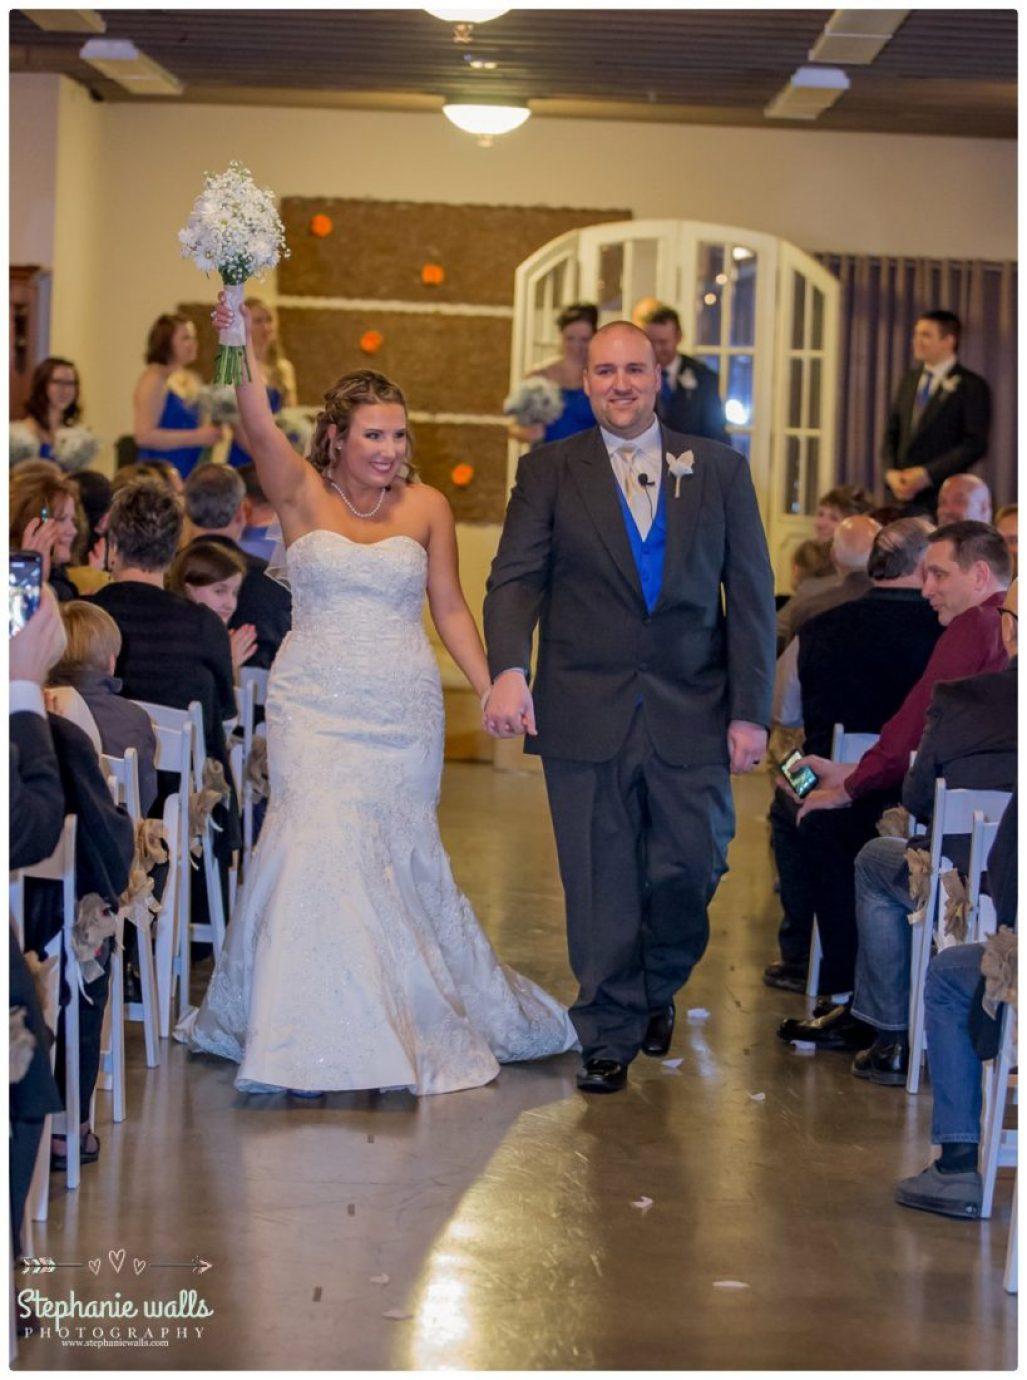 2016 03 24 0024 Racing Love   Snohomish Event Center   Snohomish Wedding Photographer